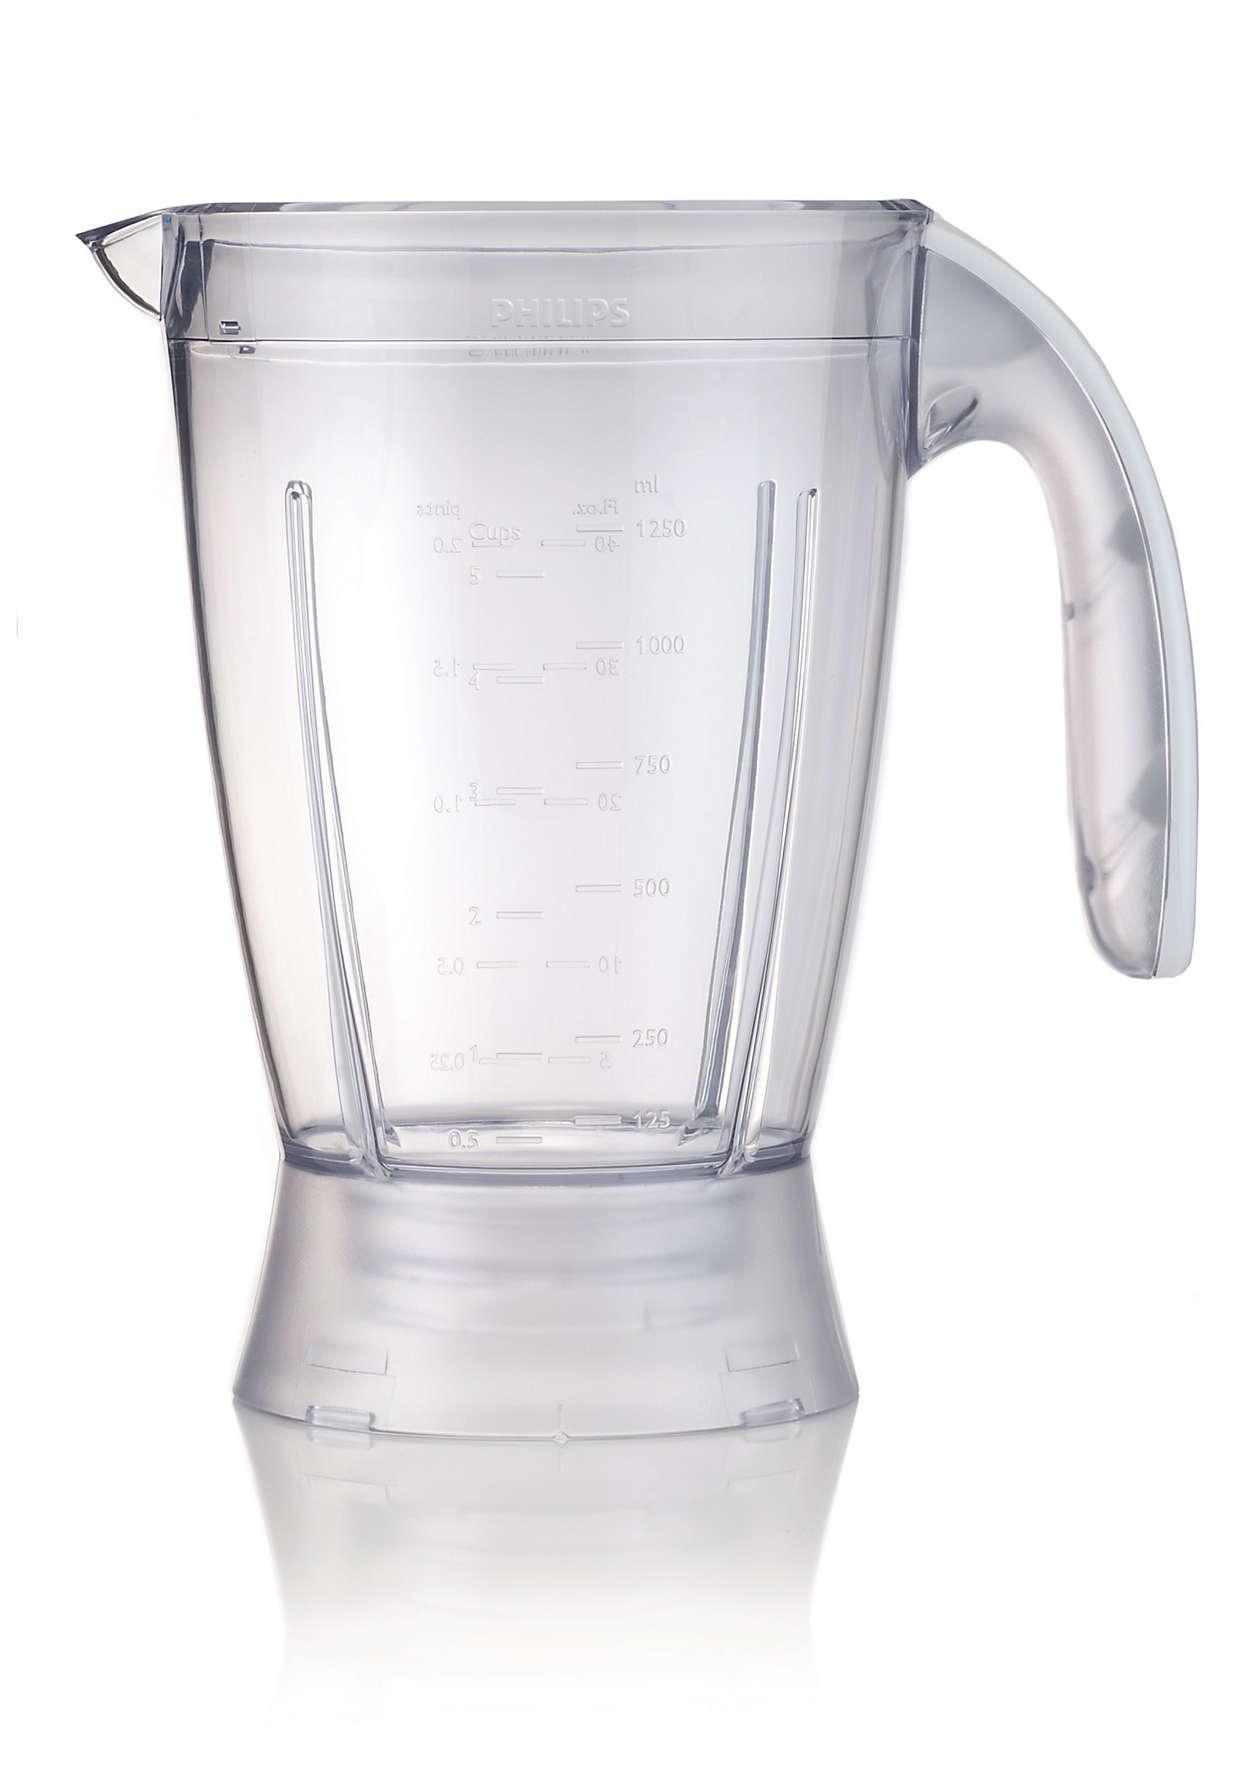 Blender jar crp566 01 philips - Licuadora philips juicer ...